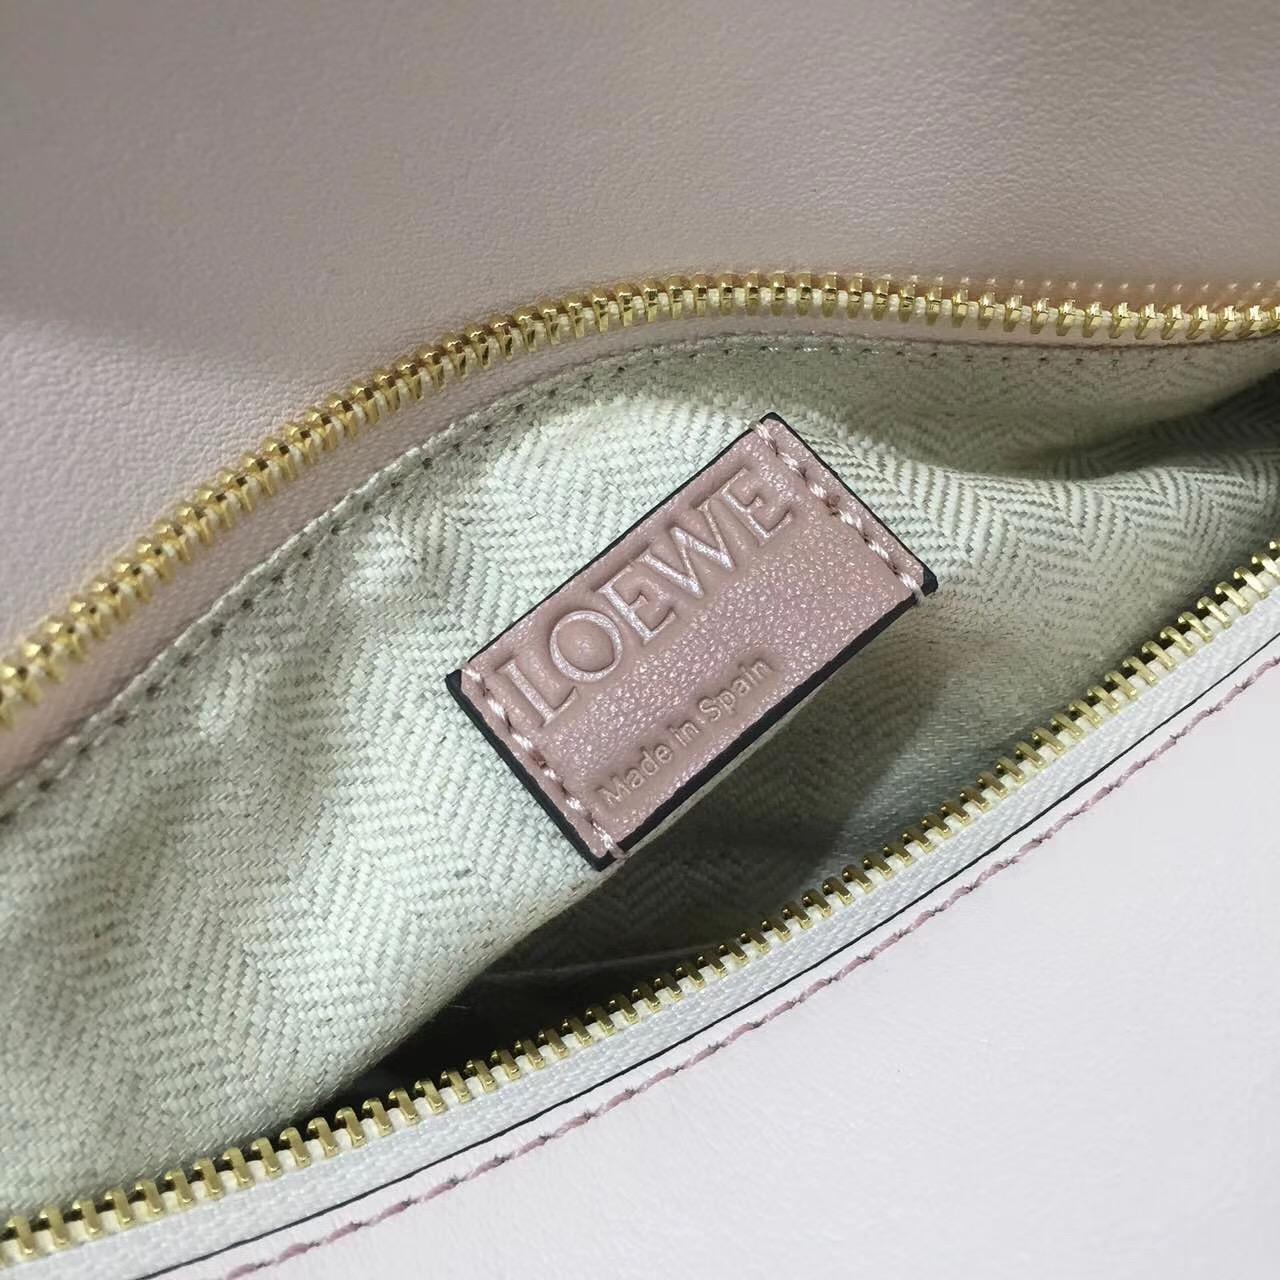 Loewe羅意威 Puzzle Bag Blush Multitone